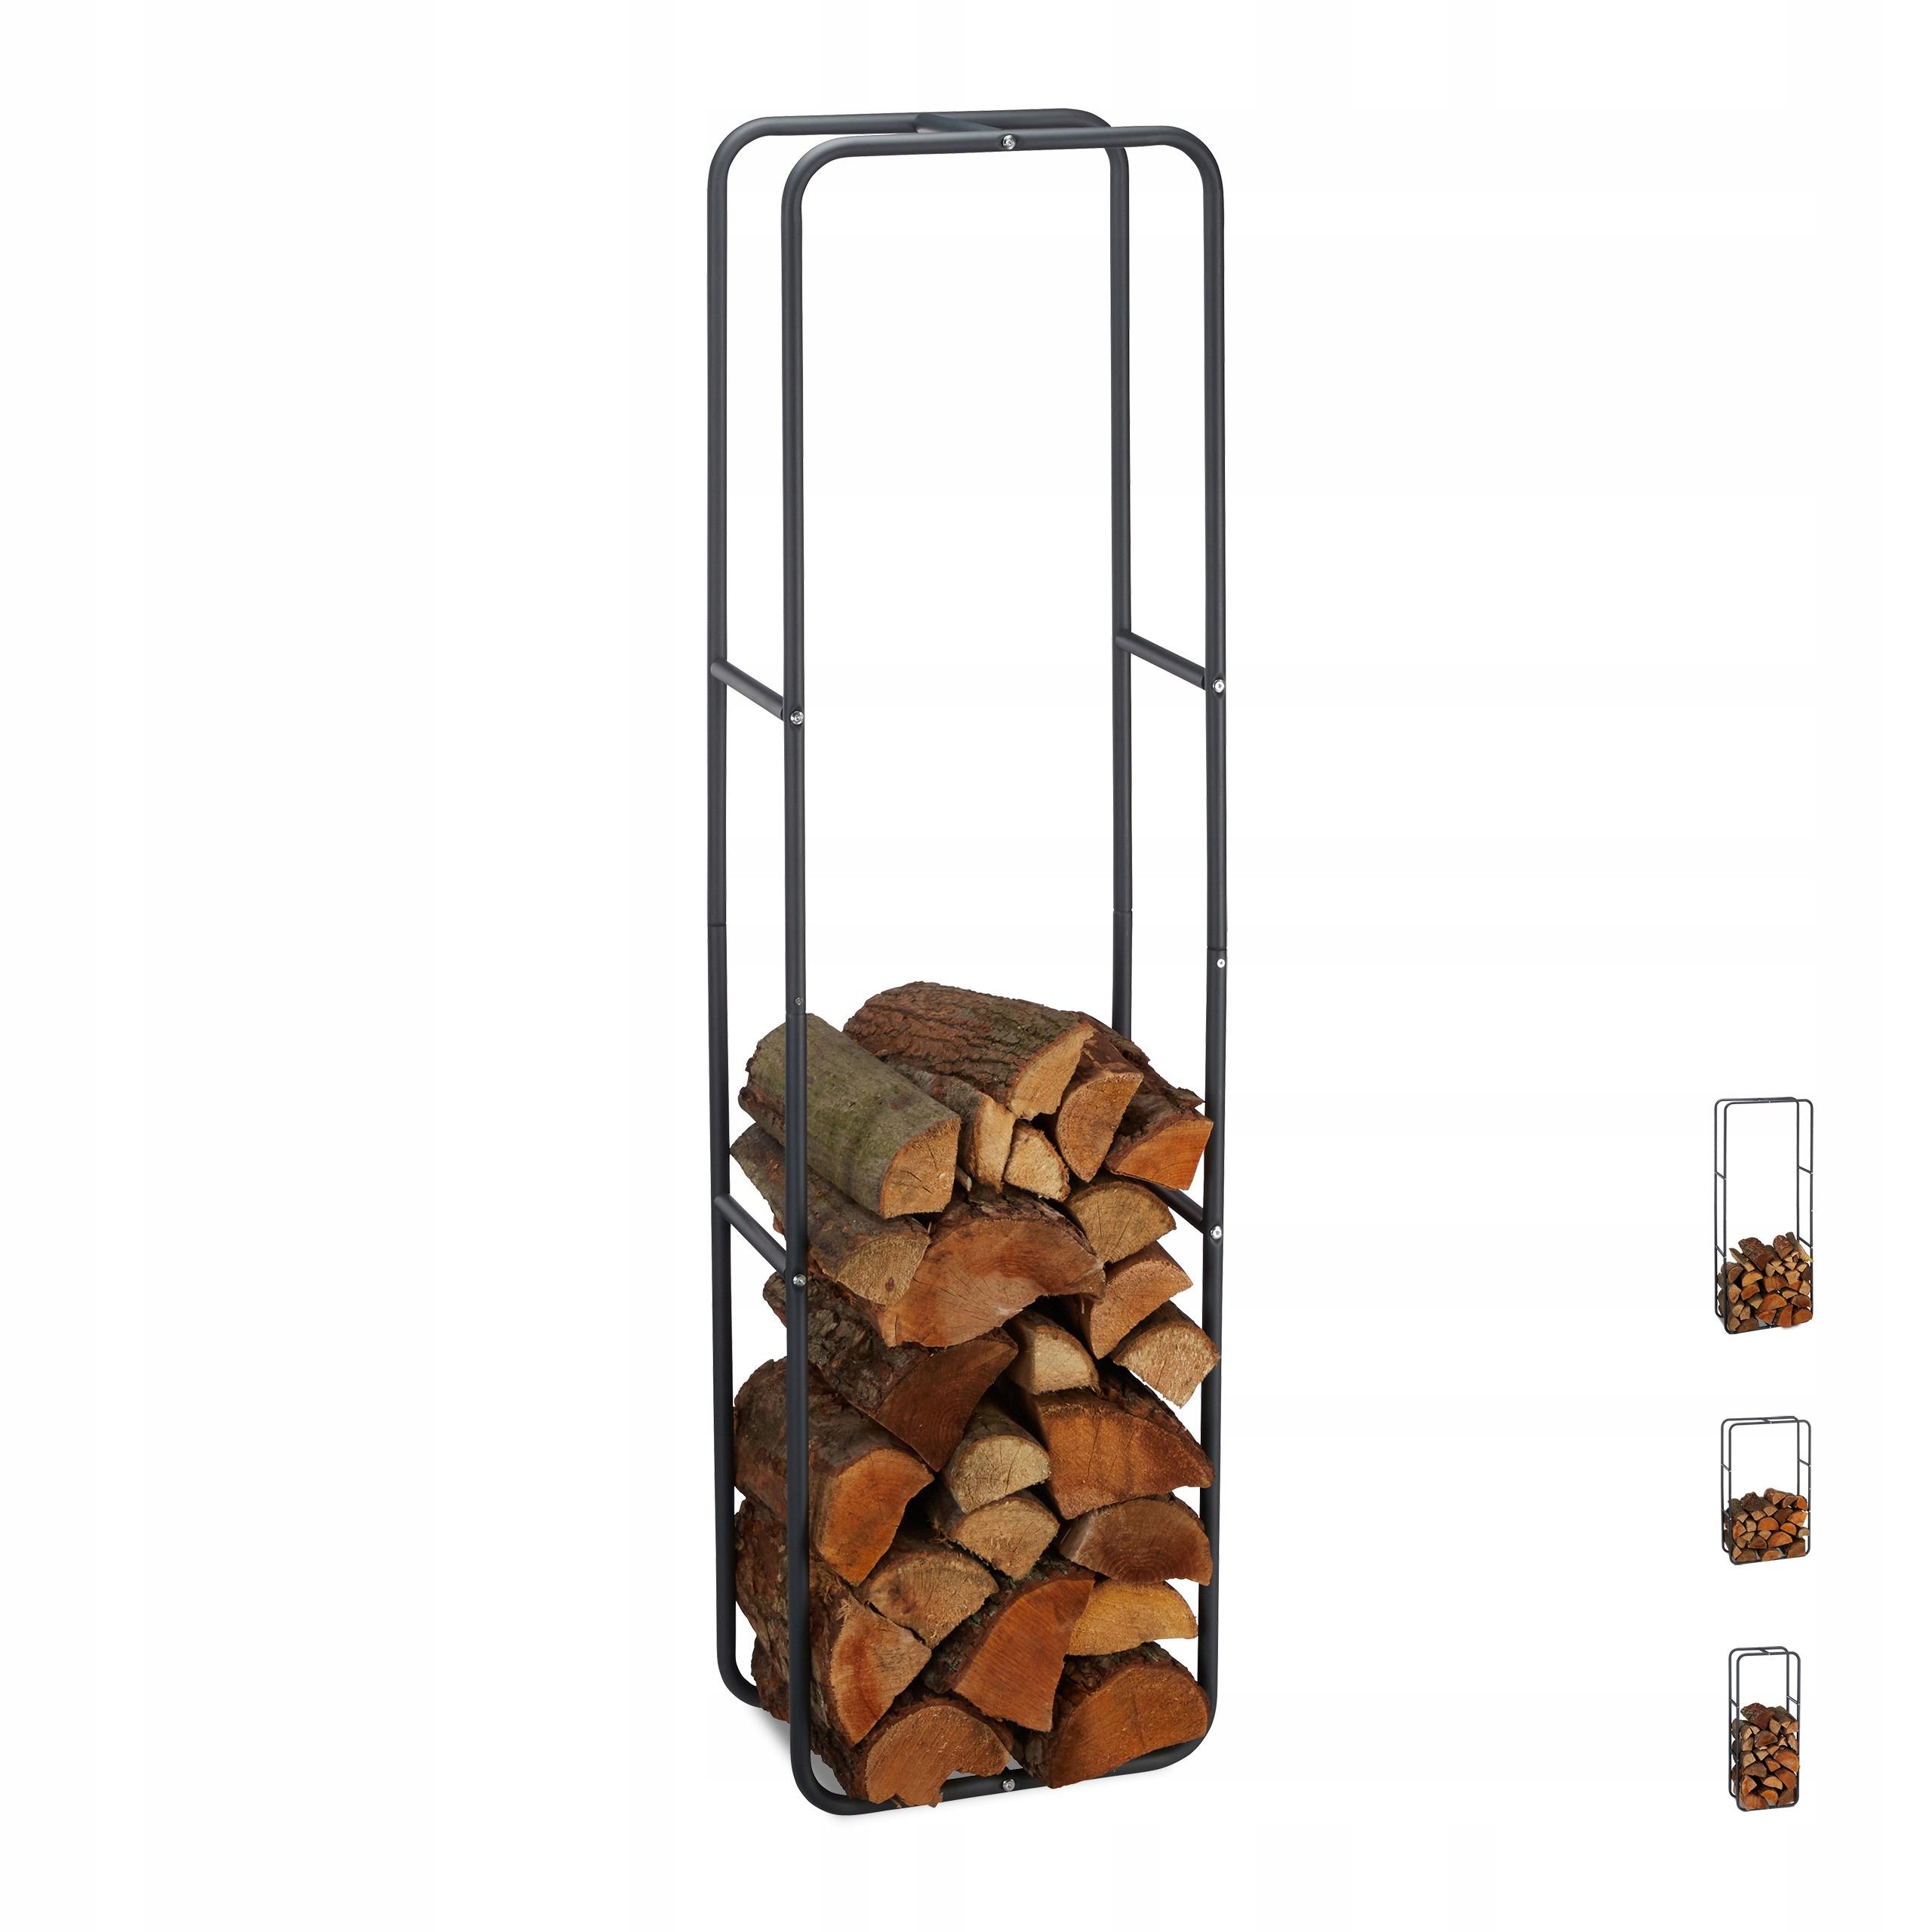 Стальная подставка, стеллаж для камина на дровах